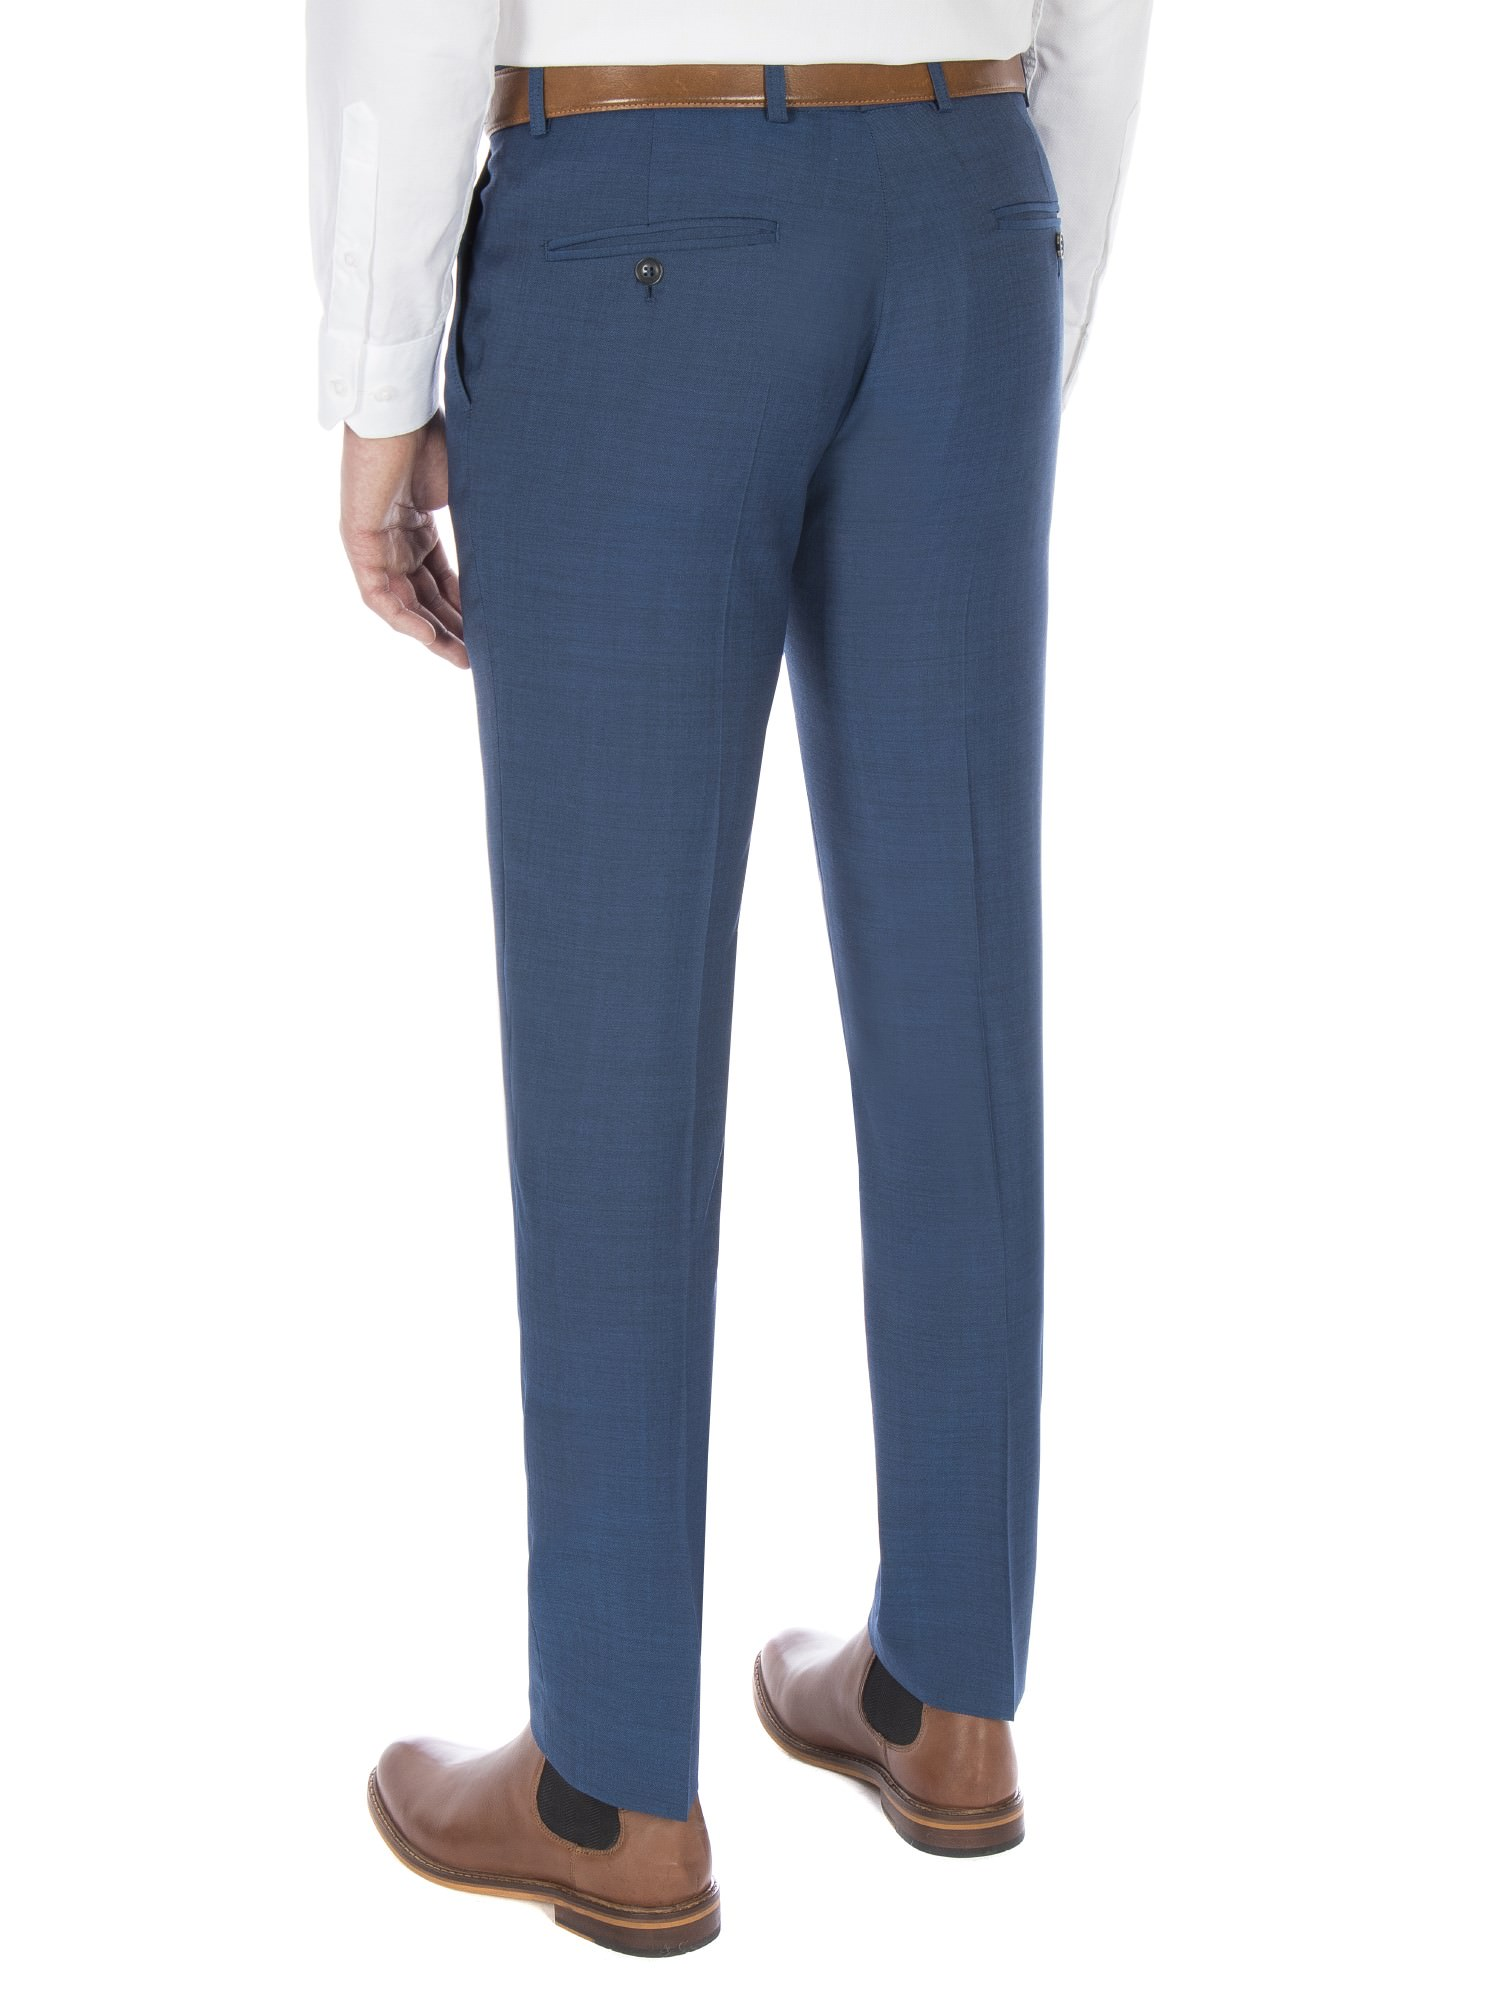 Dark Teal Blue Tonic Camden Trouser